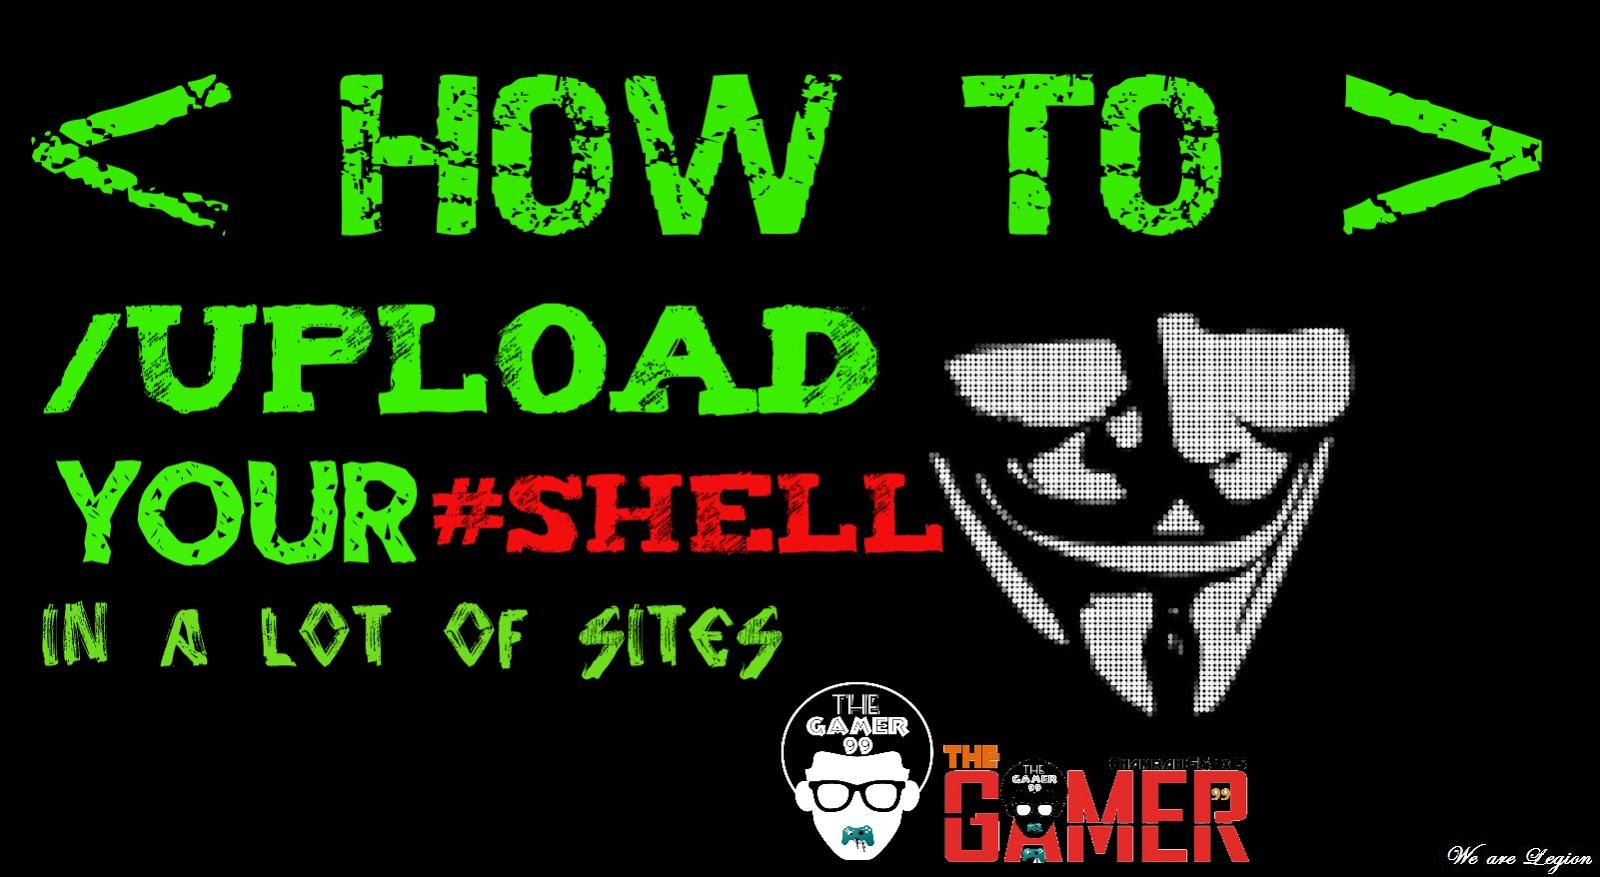 dork shell upload exploit 2018 news - tools hack